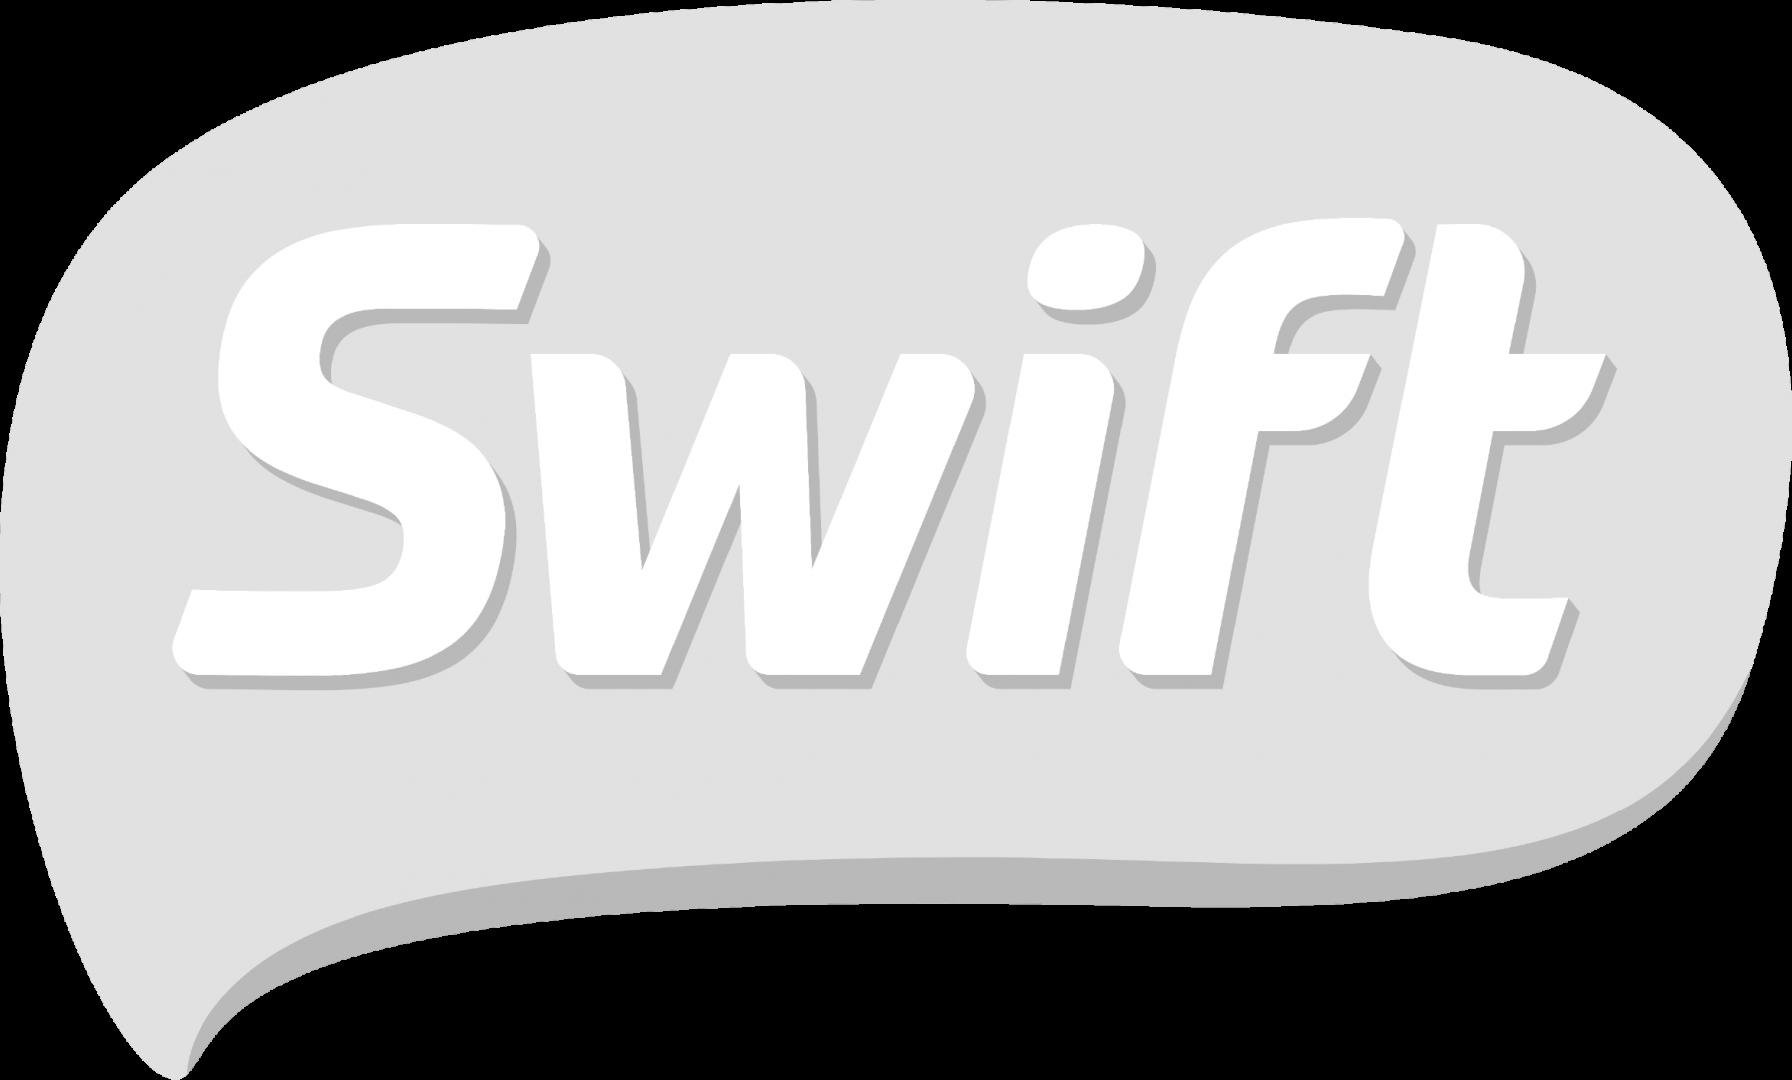 Swift – Segmentos